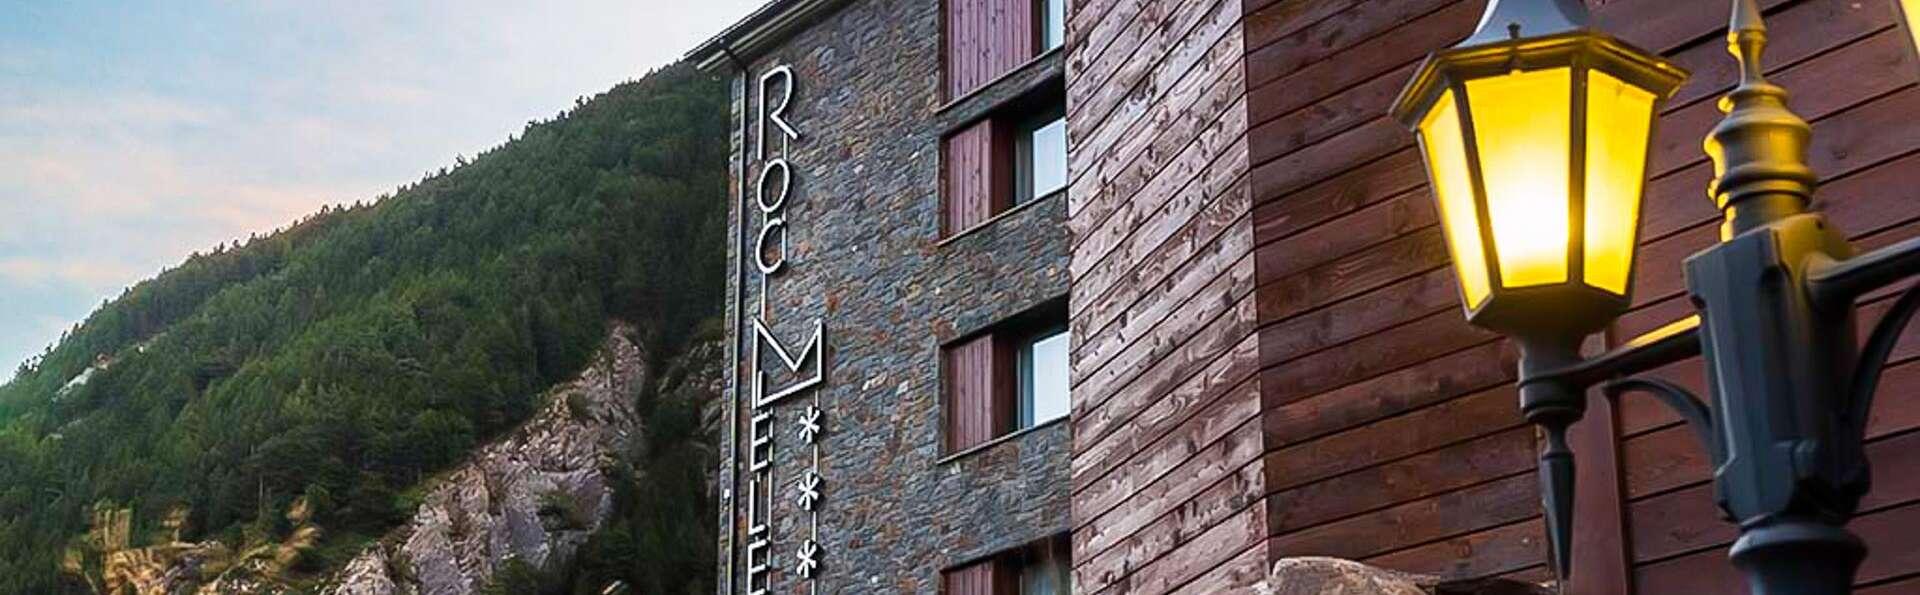 Hotel Roc Meler - EDIT_N2_FRONT_01.jpg